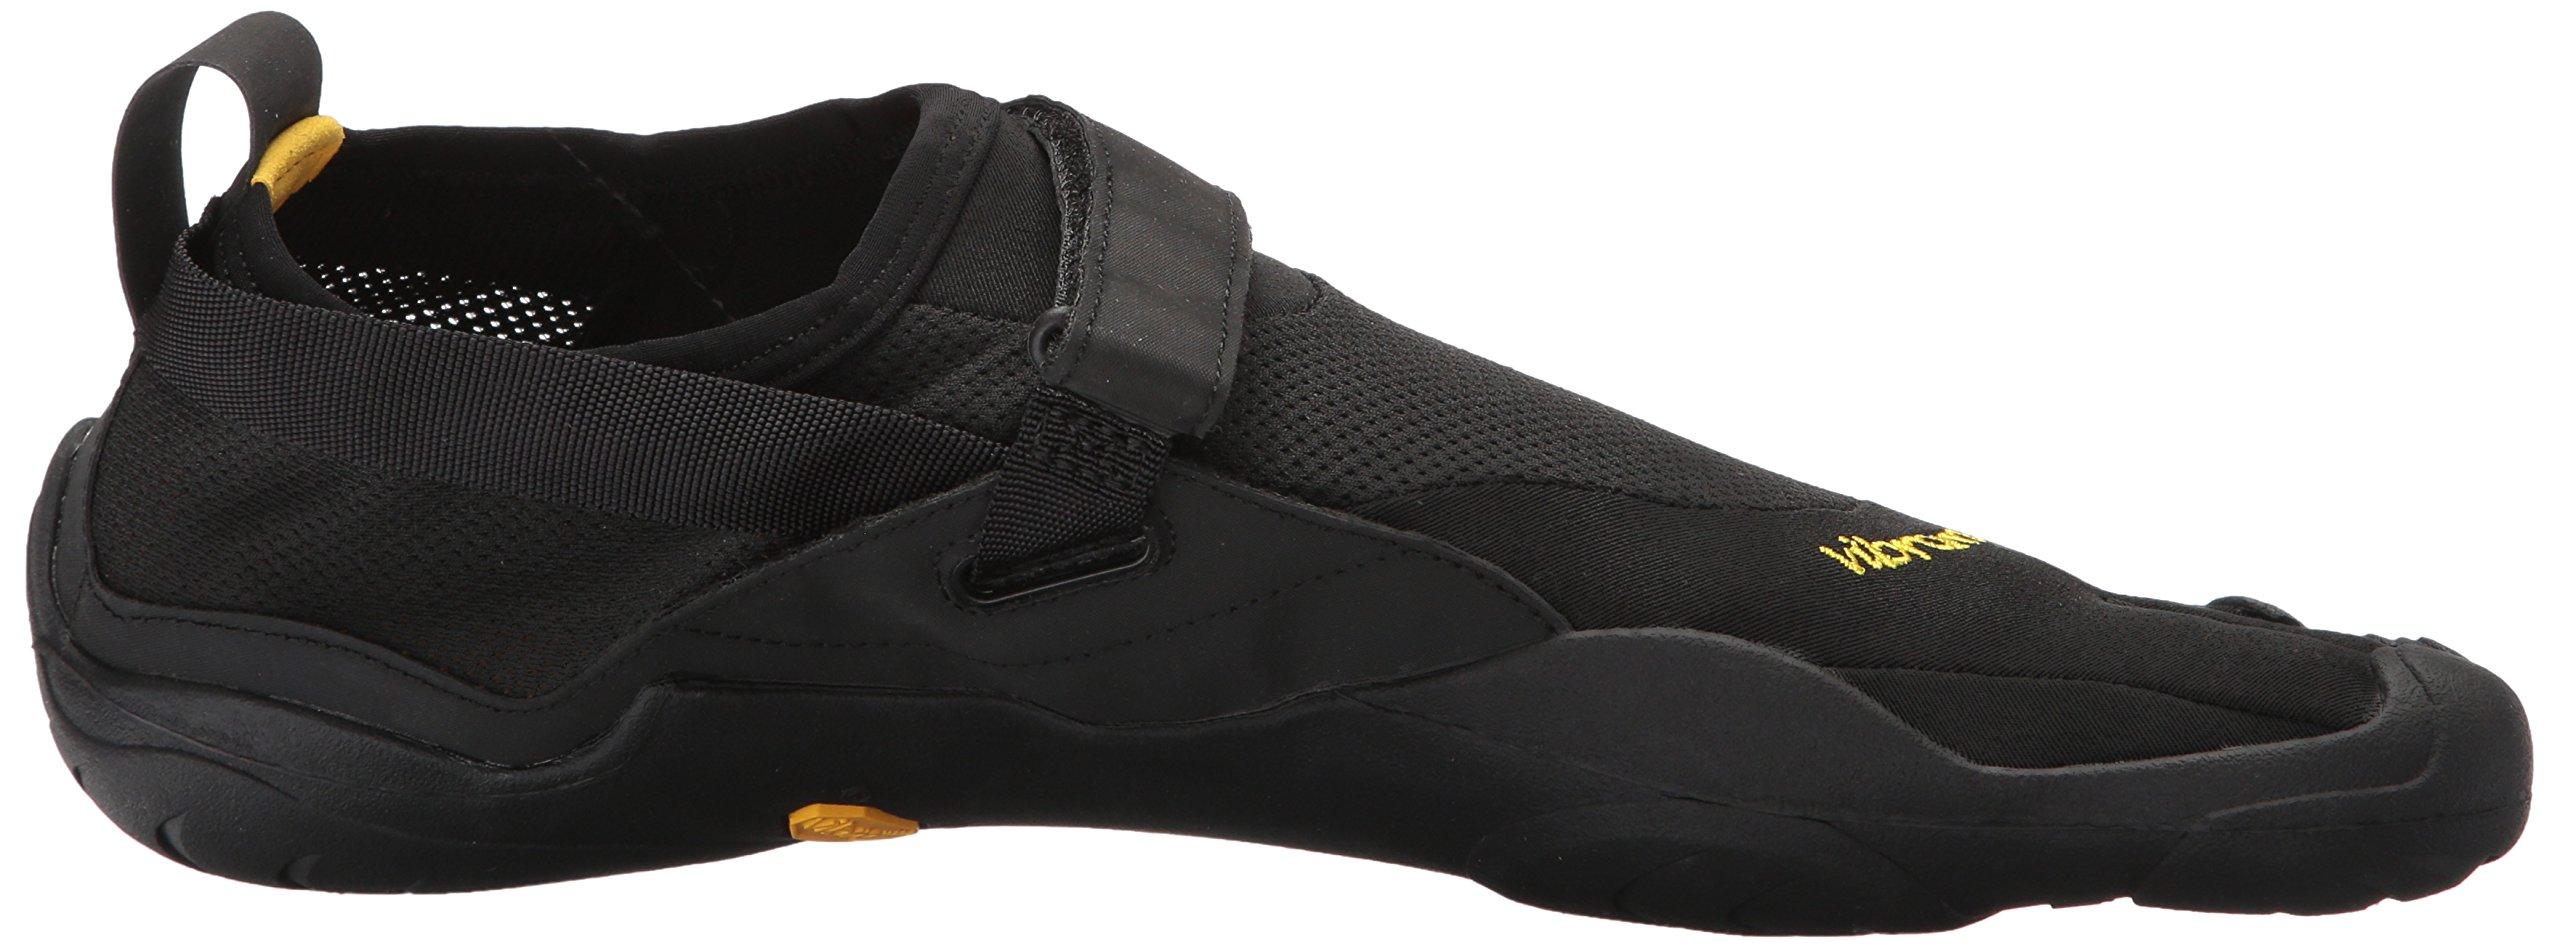 Vibram Men's Five Fingers, KSO EVO Cross Training Shoe Black Black 4.4 M by Vibram (Image #7)